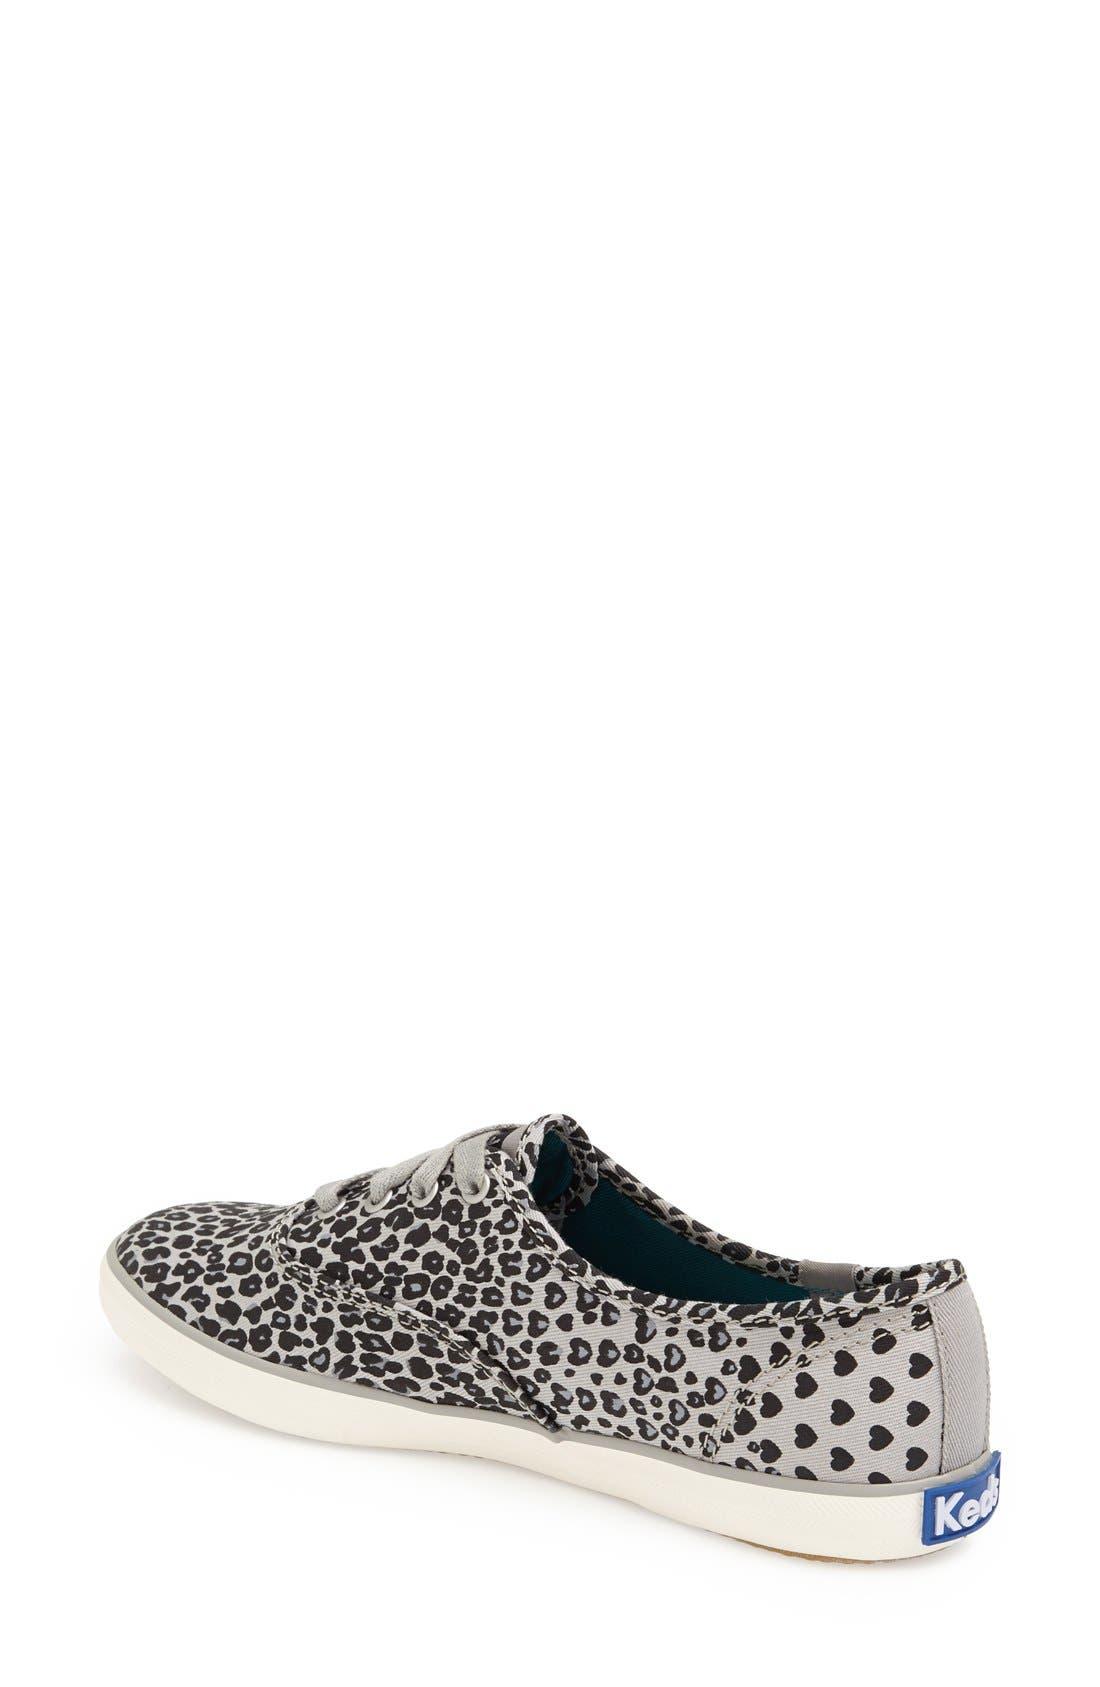 Alternate Image 2  - Keds® 'Champion - Leopard' Sneaker (Women)